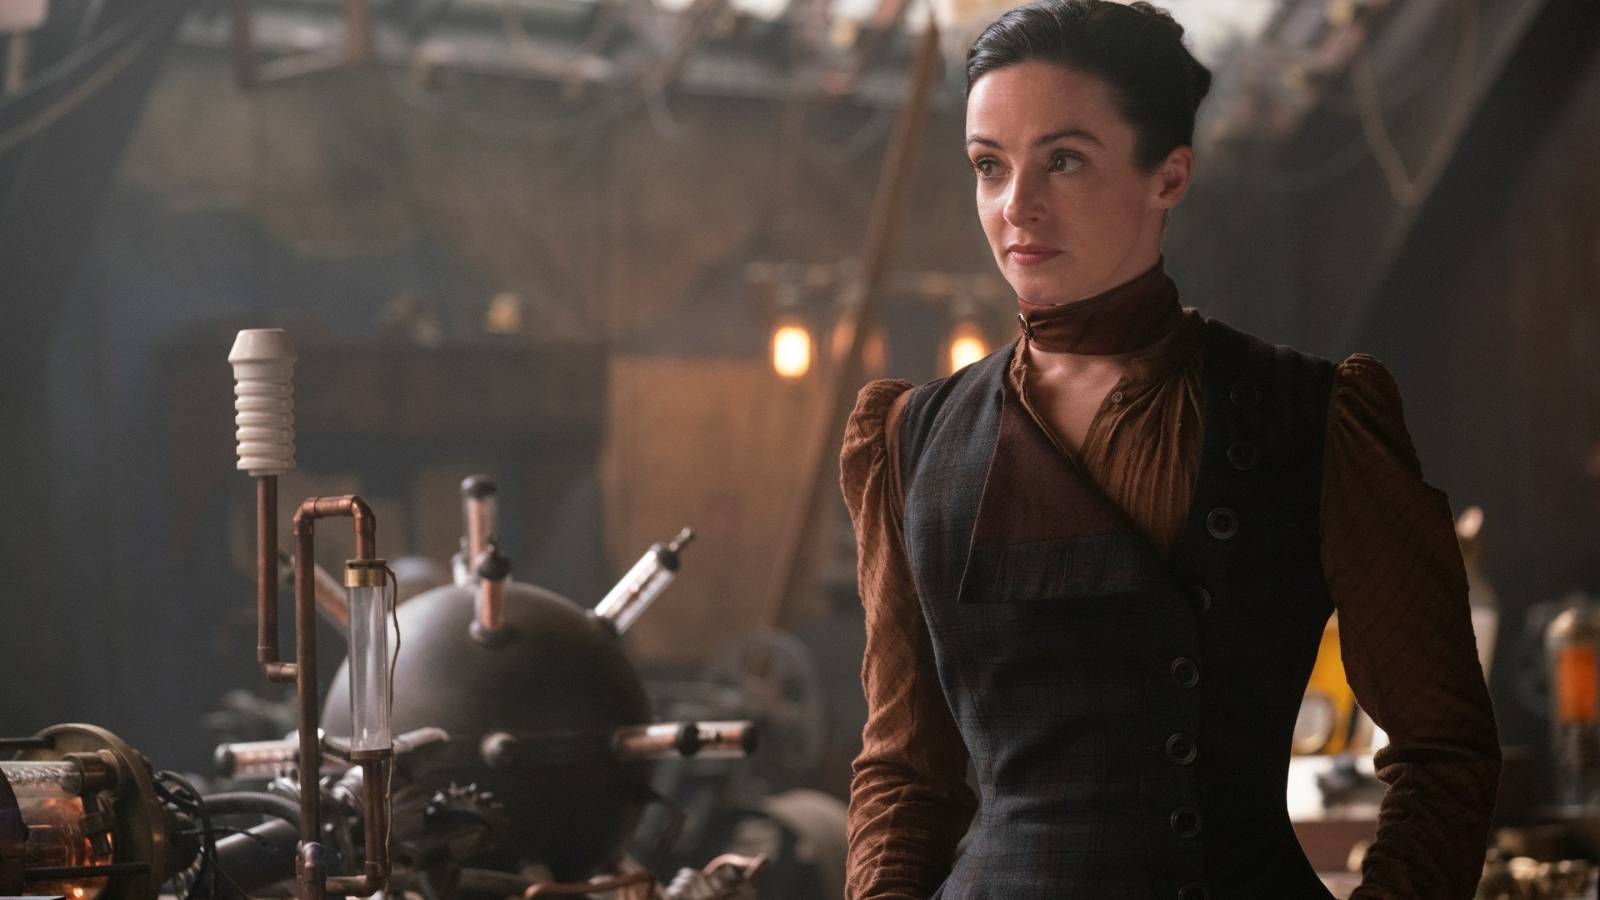 Neon's female-led sci-fi fantasy The Nevers shows plenty of promise